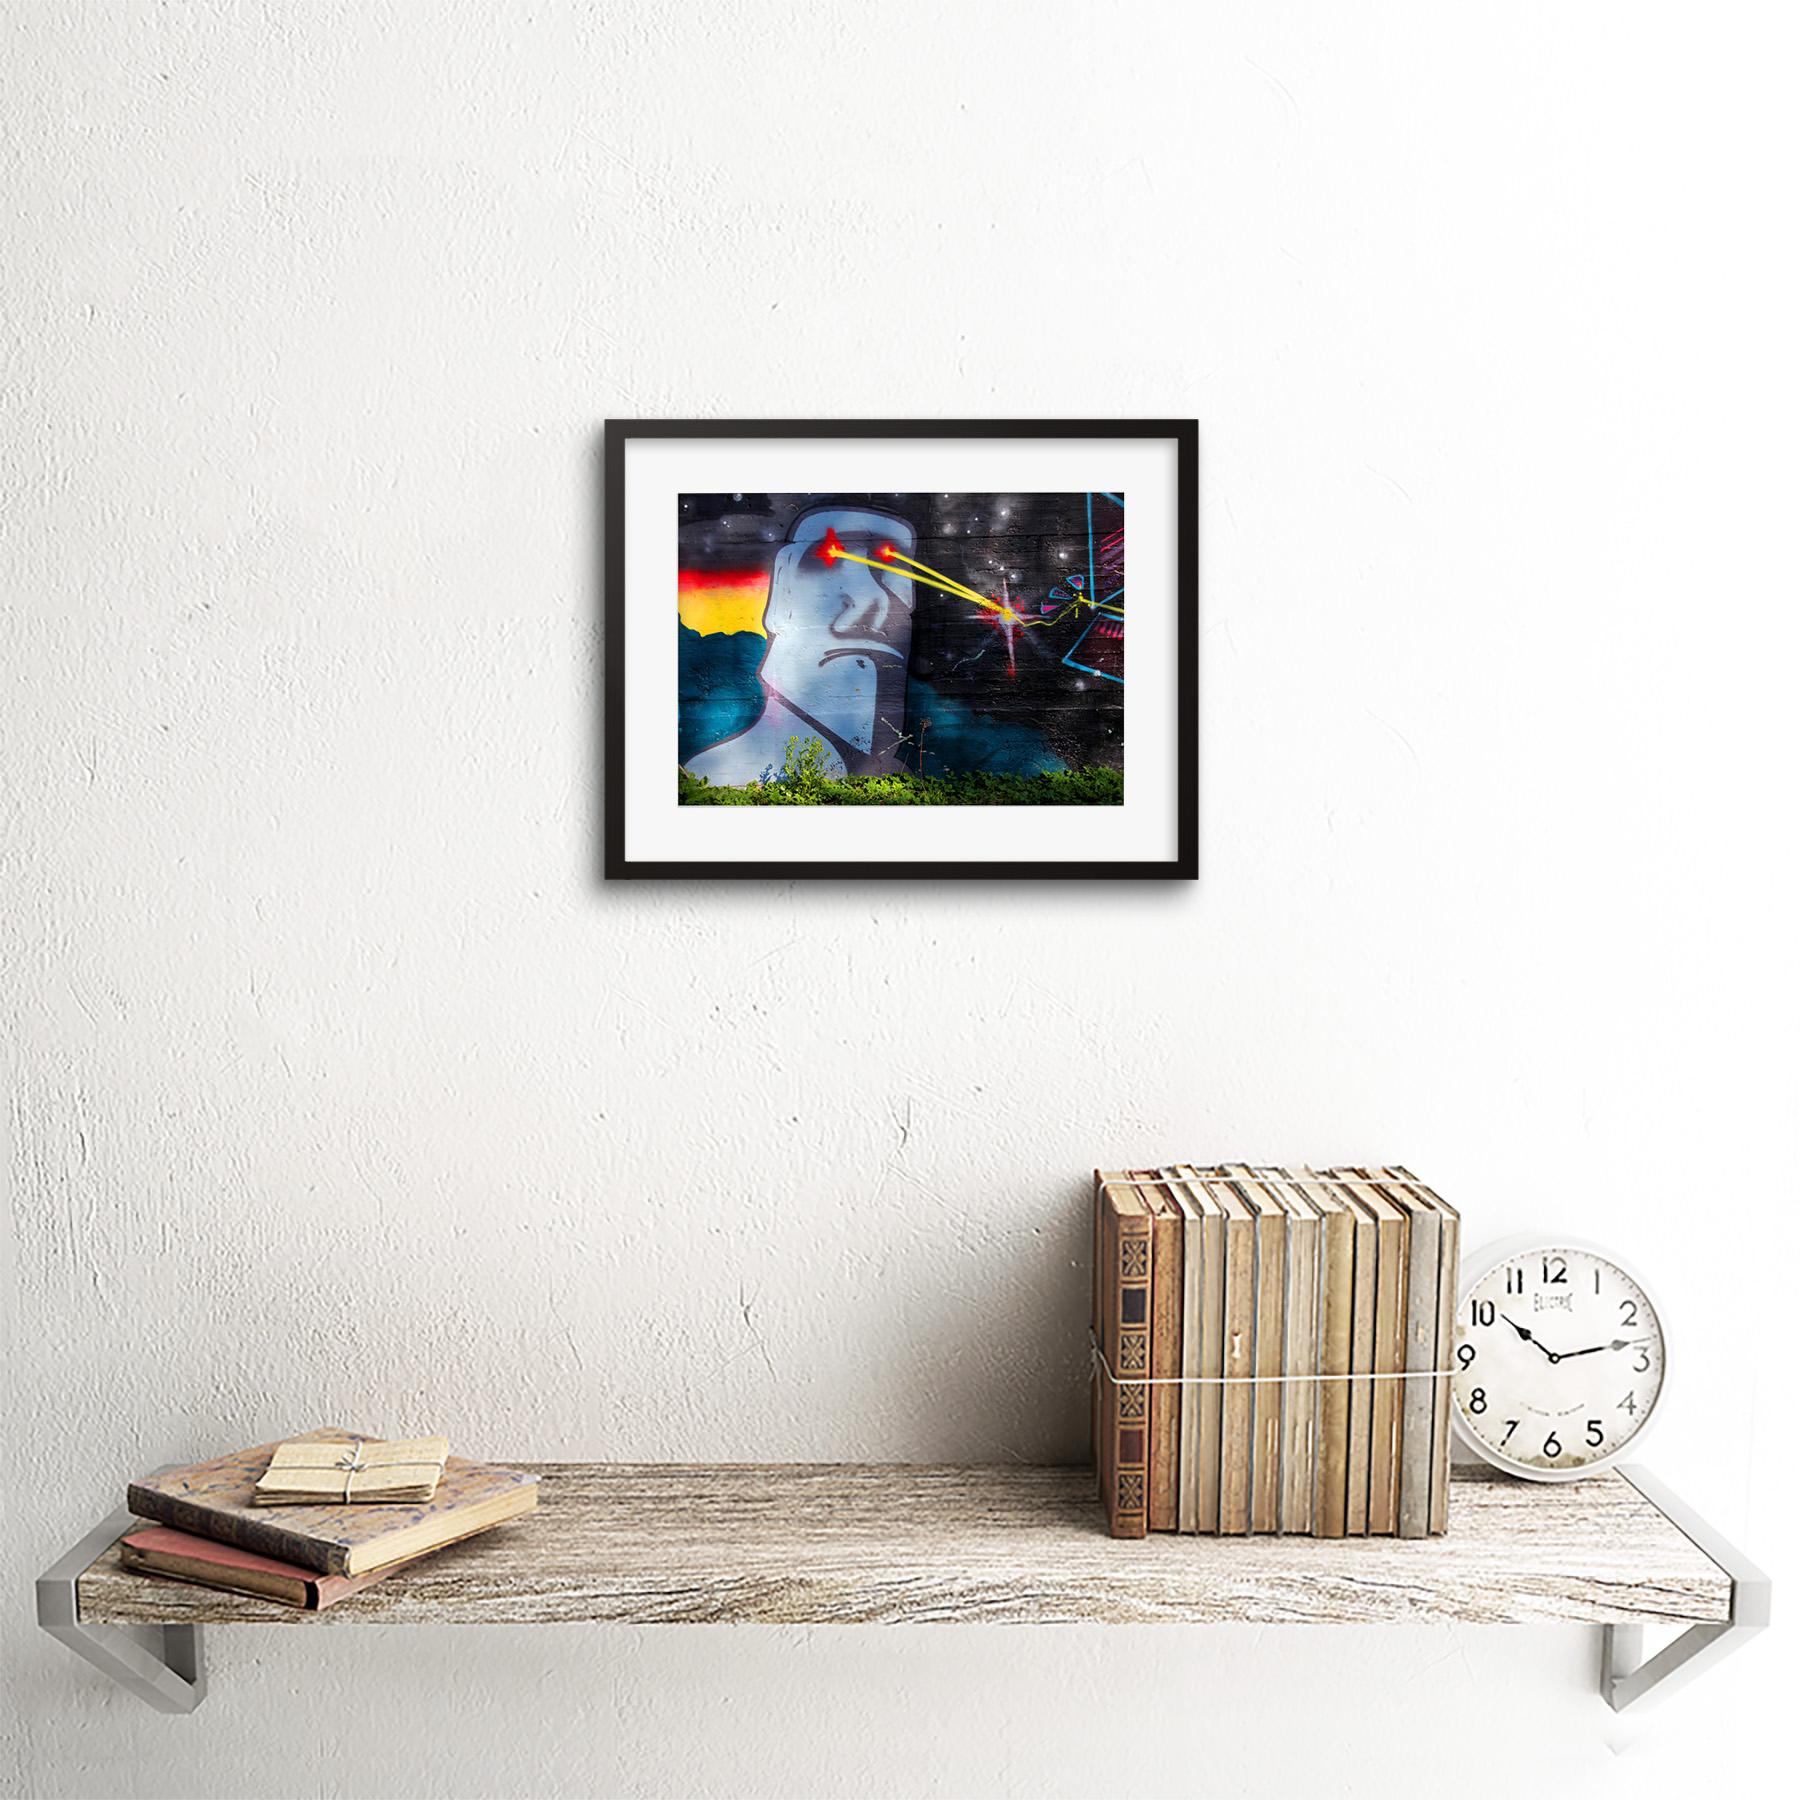 Graffiti-Easter-Island-Head-Laser-Art-Print-Framed-Poster-Wall-Decor miniature 3